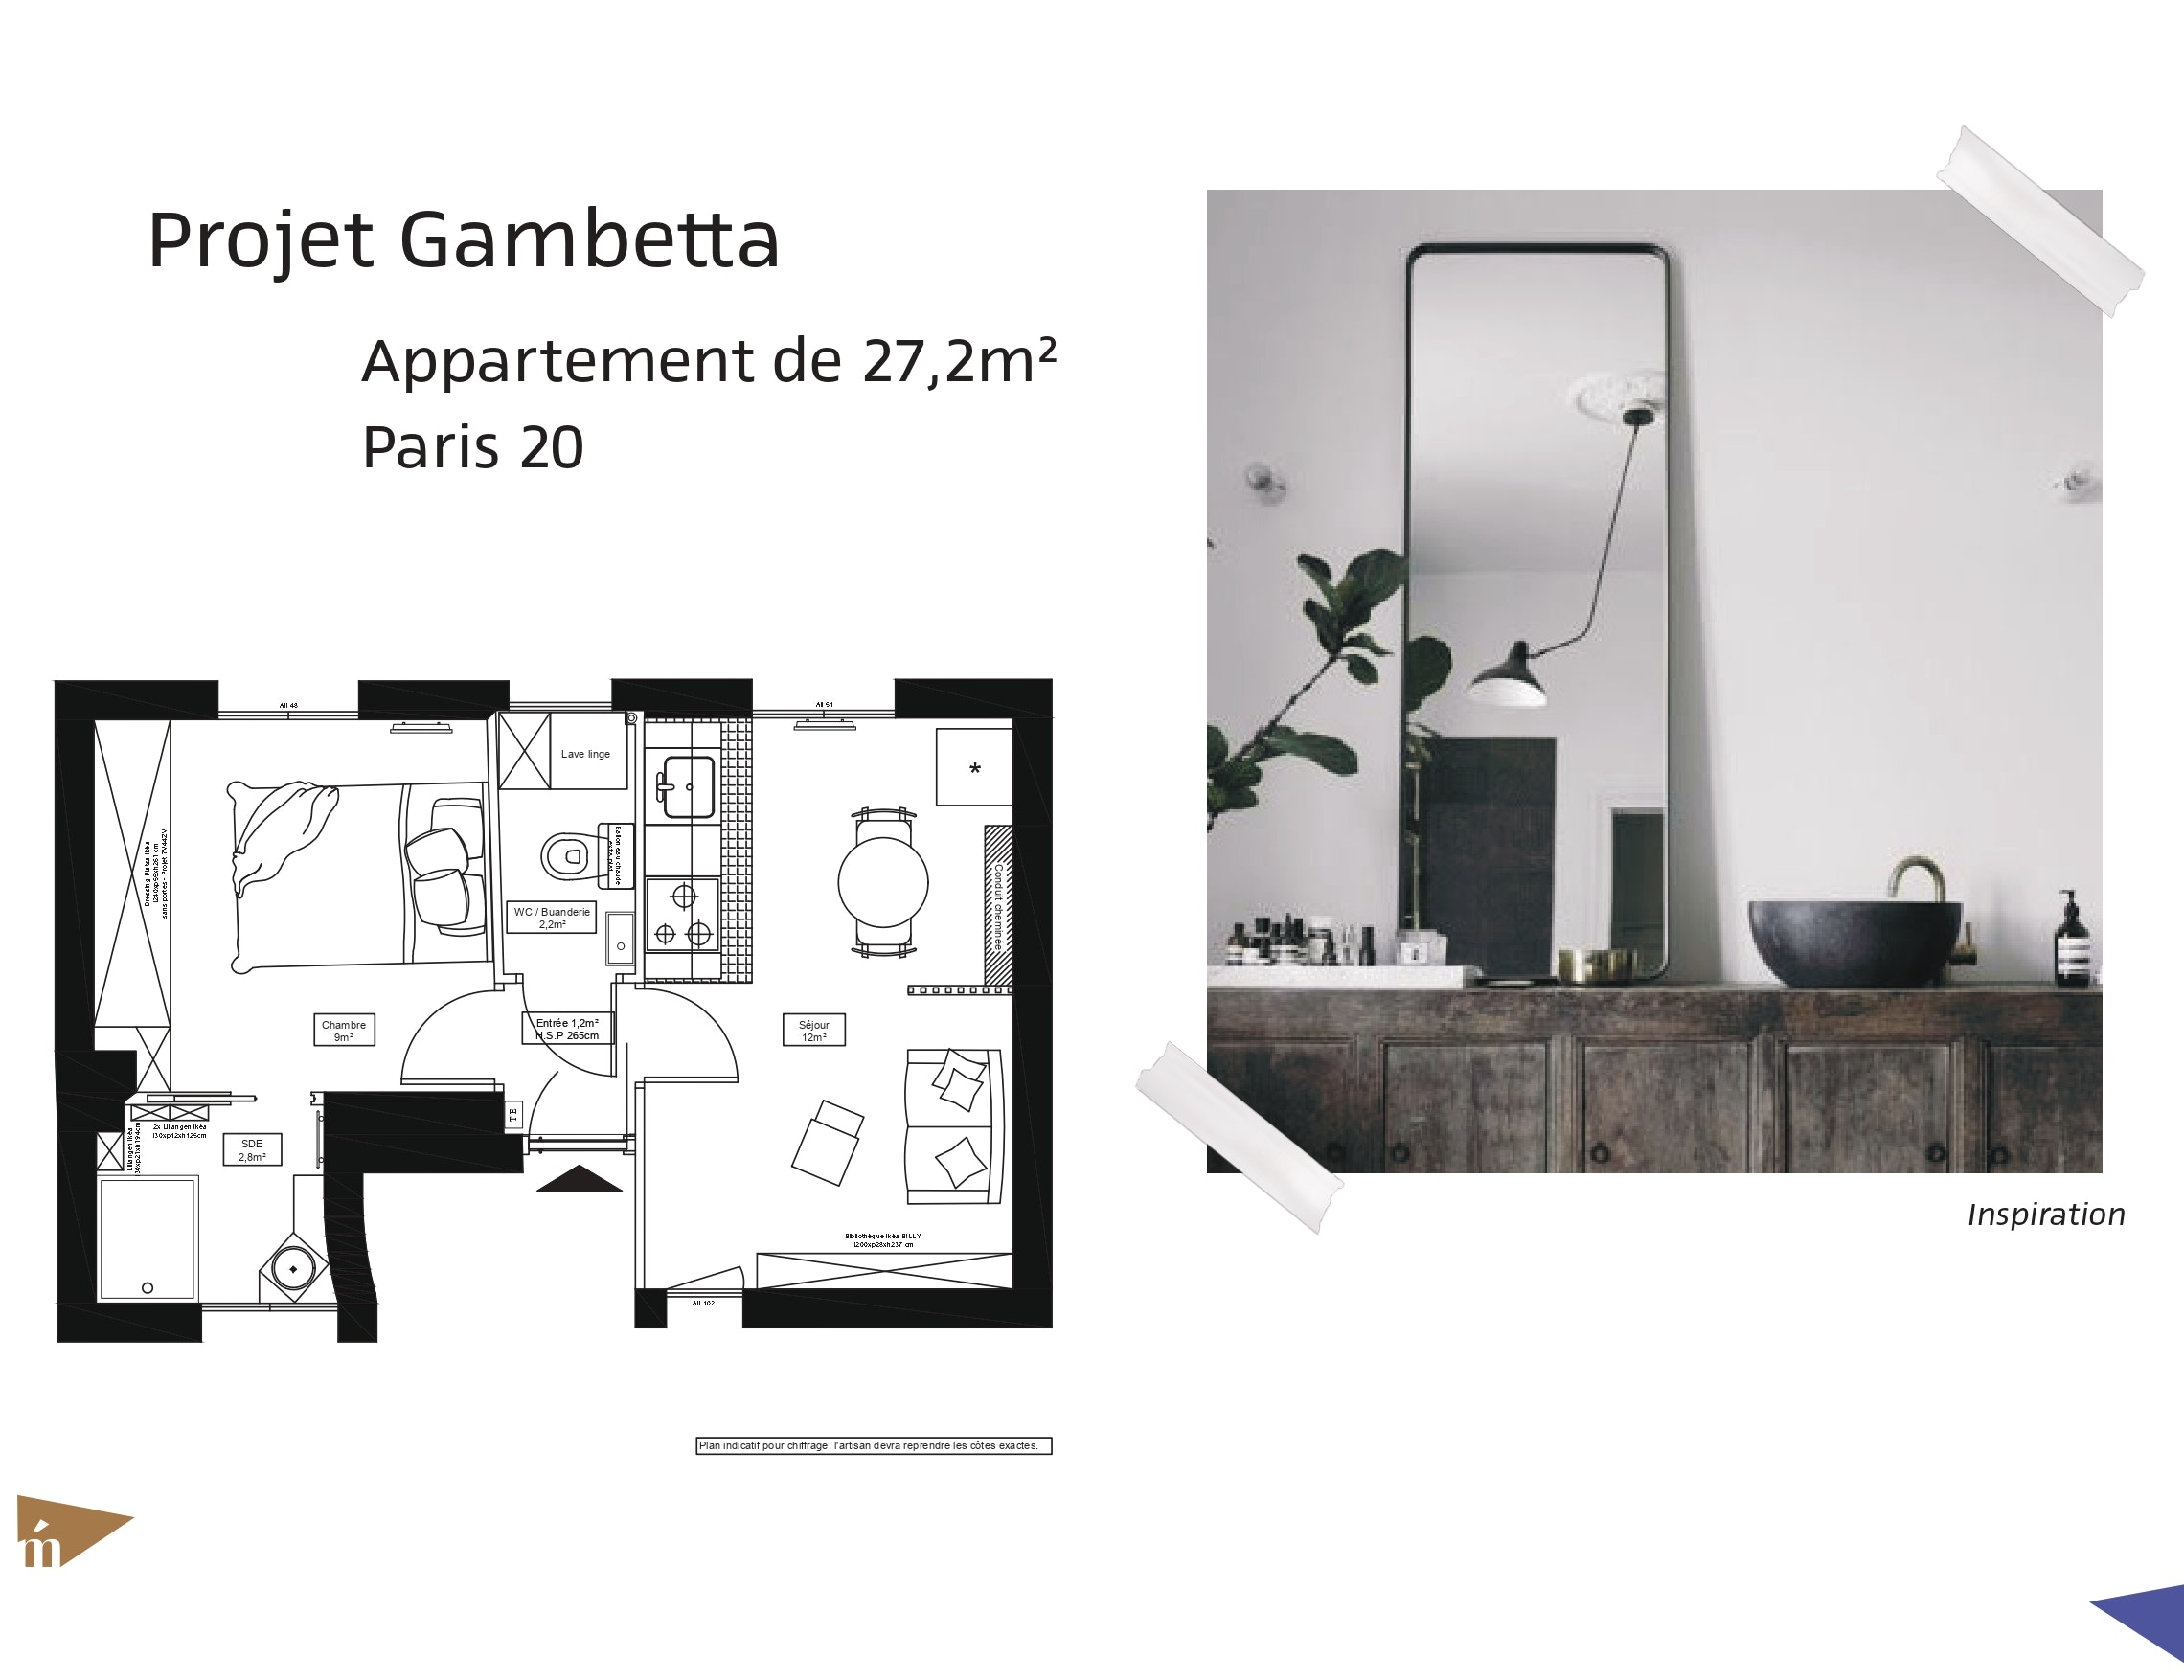 photo Projet Gambetta - Appartement 27,2 m² - Paris 20 Léa Mast - Architecte hemea